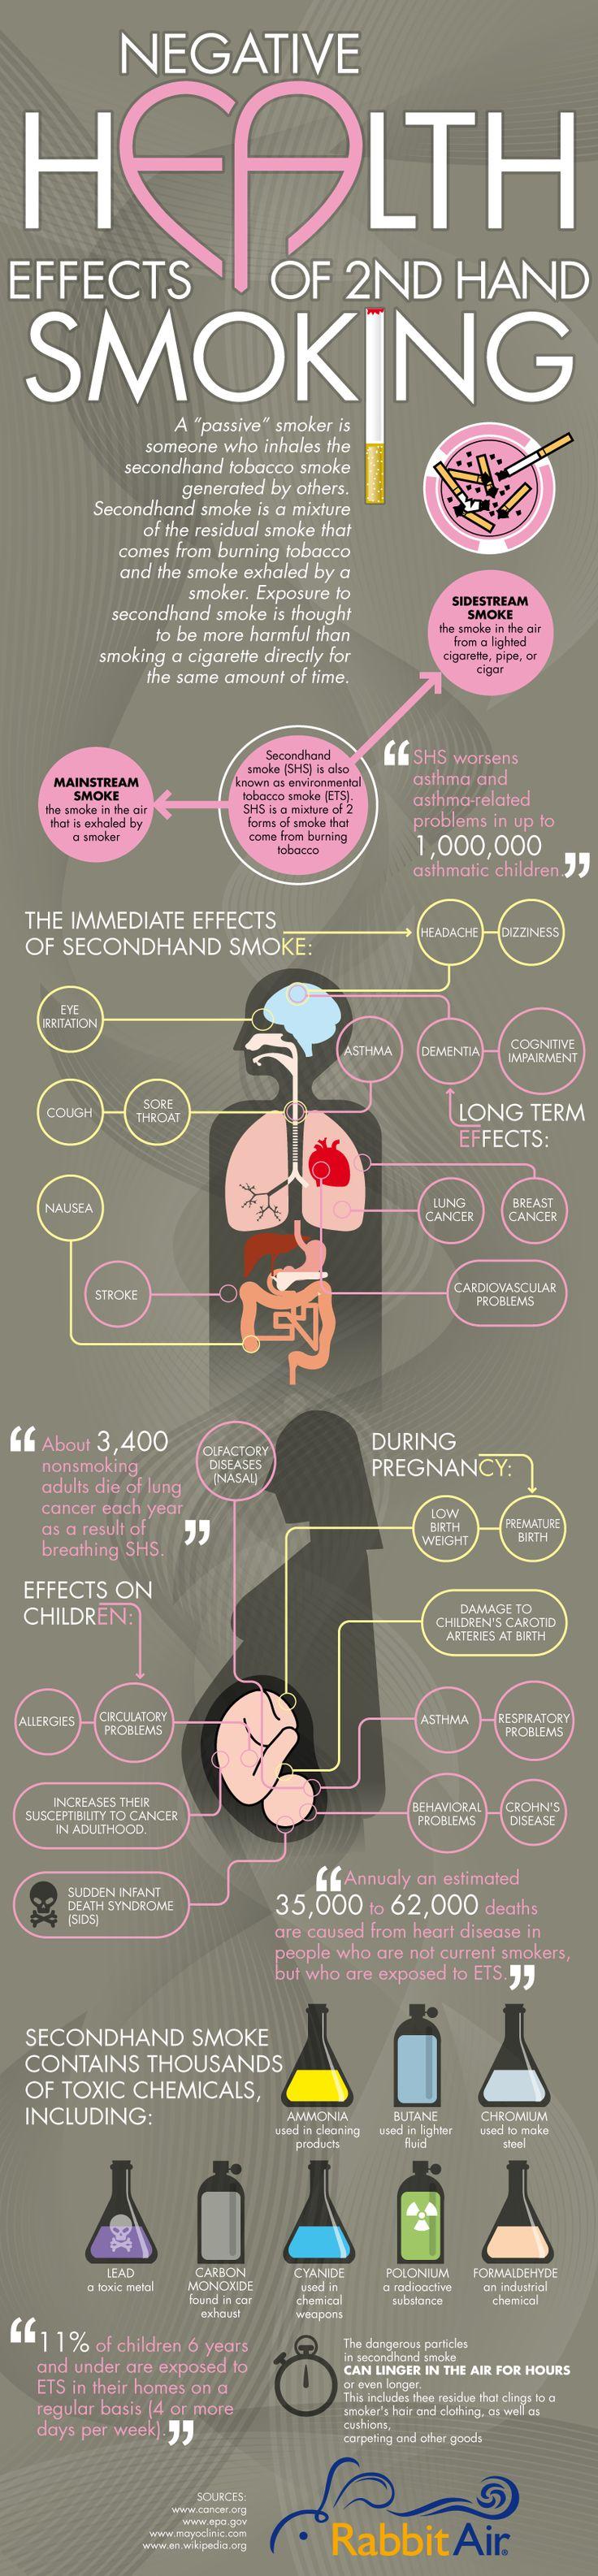 Second Hand Smoke Dangers - iNFOGRAPHiCs MANiAiNFOGRAPHiCsMANiA